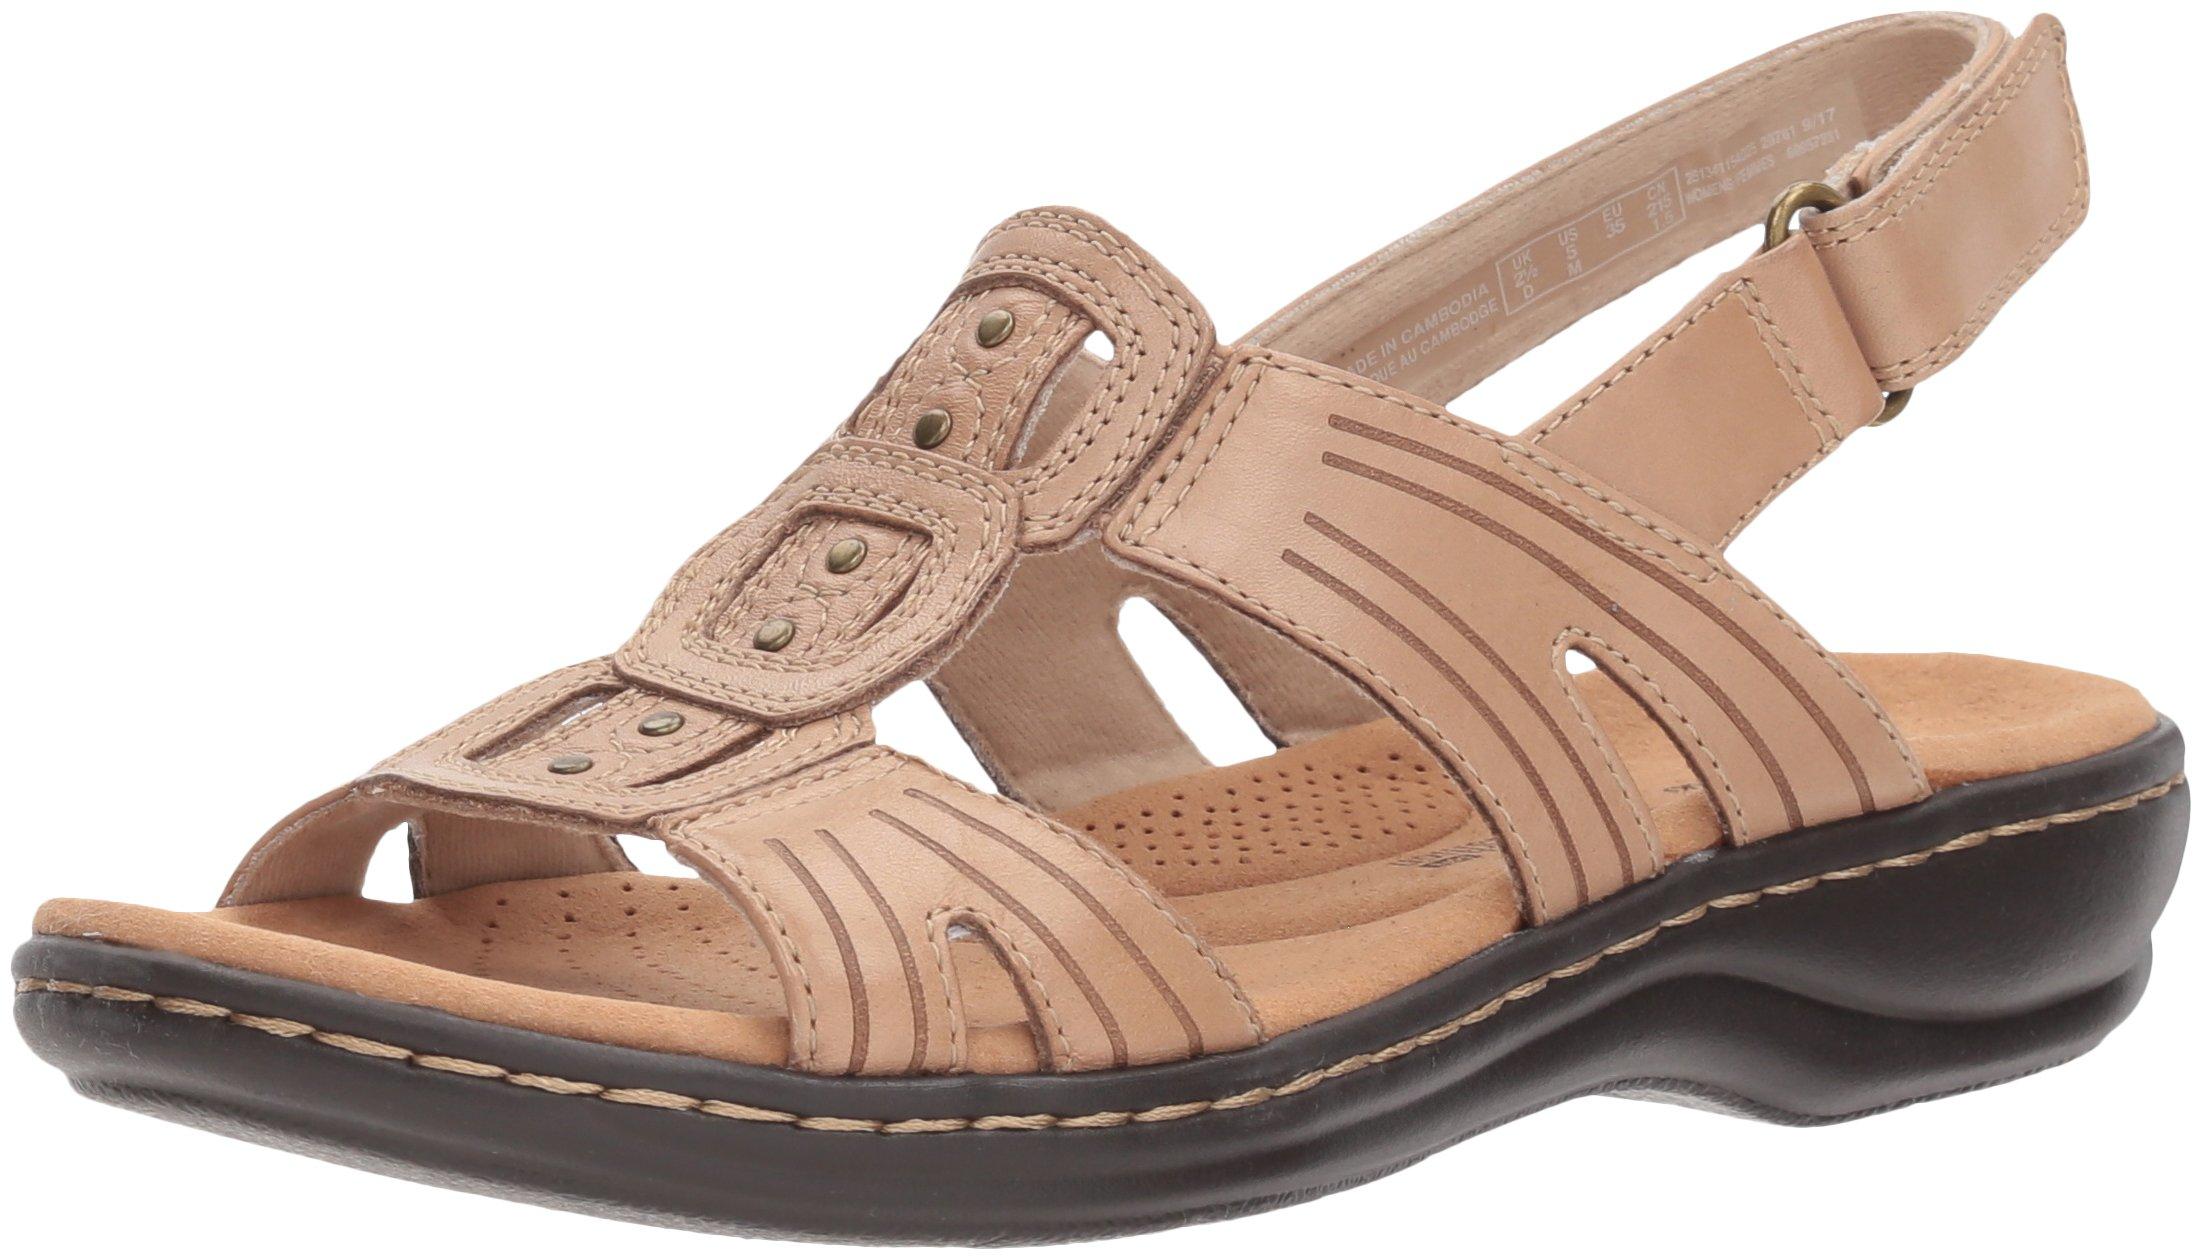 CLARKS Women's Leisa Vine Platform, Sand Leather, 9.5 Wide US